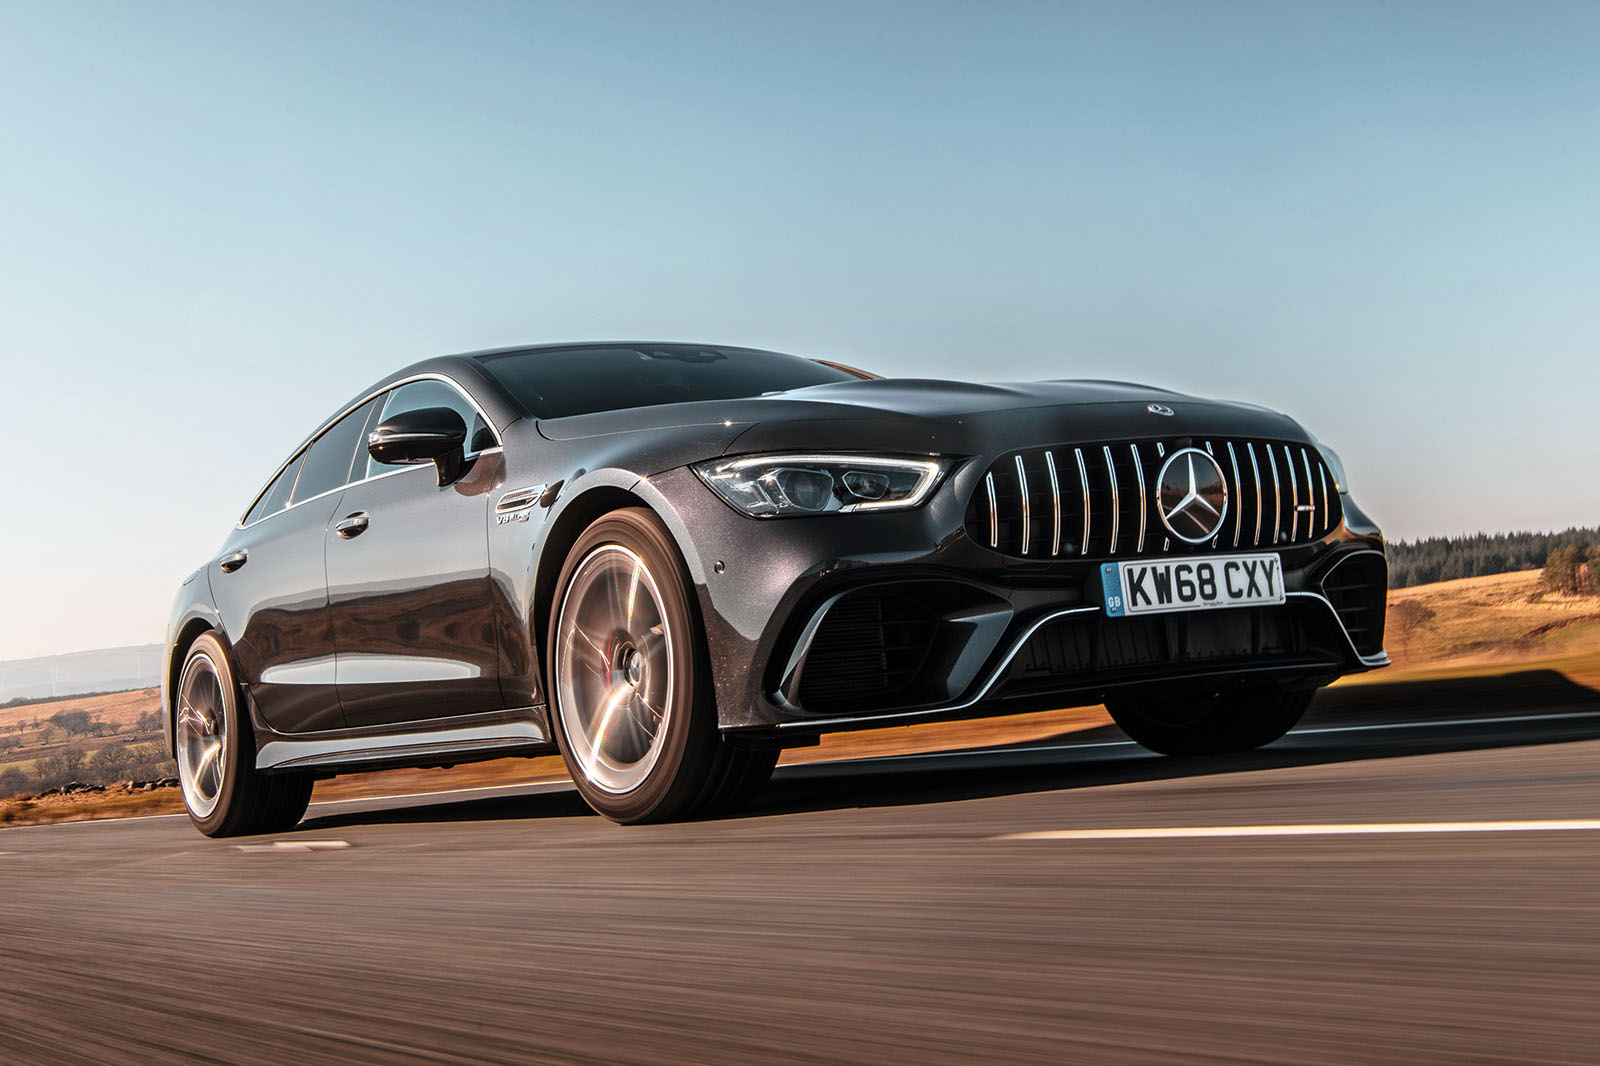 Mercedes Amg Gt 4 Door Coupe Review 2021 Autocar